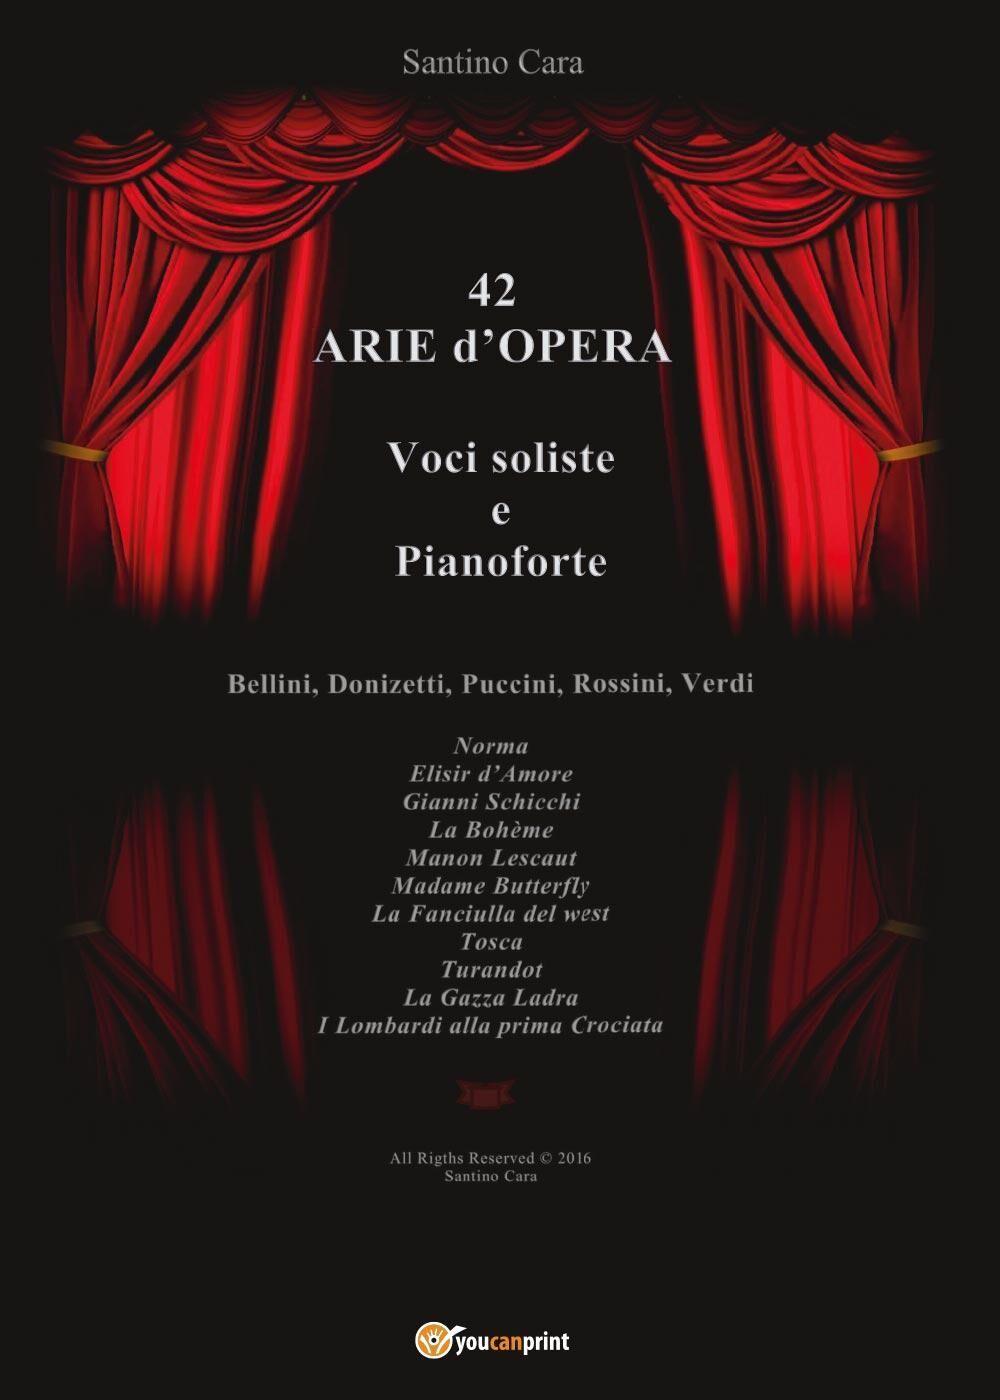 42 arie d'opera per voci soliste e pianoforte